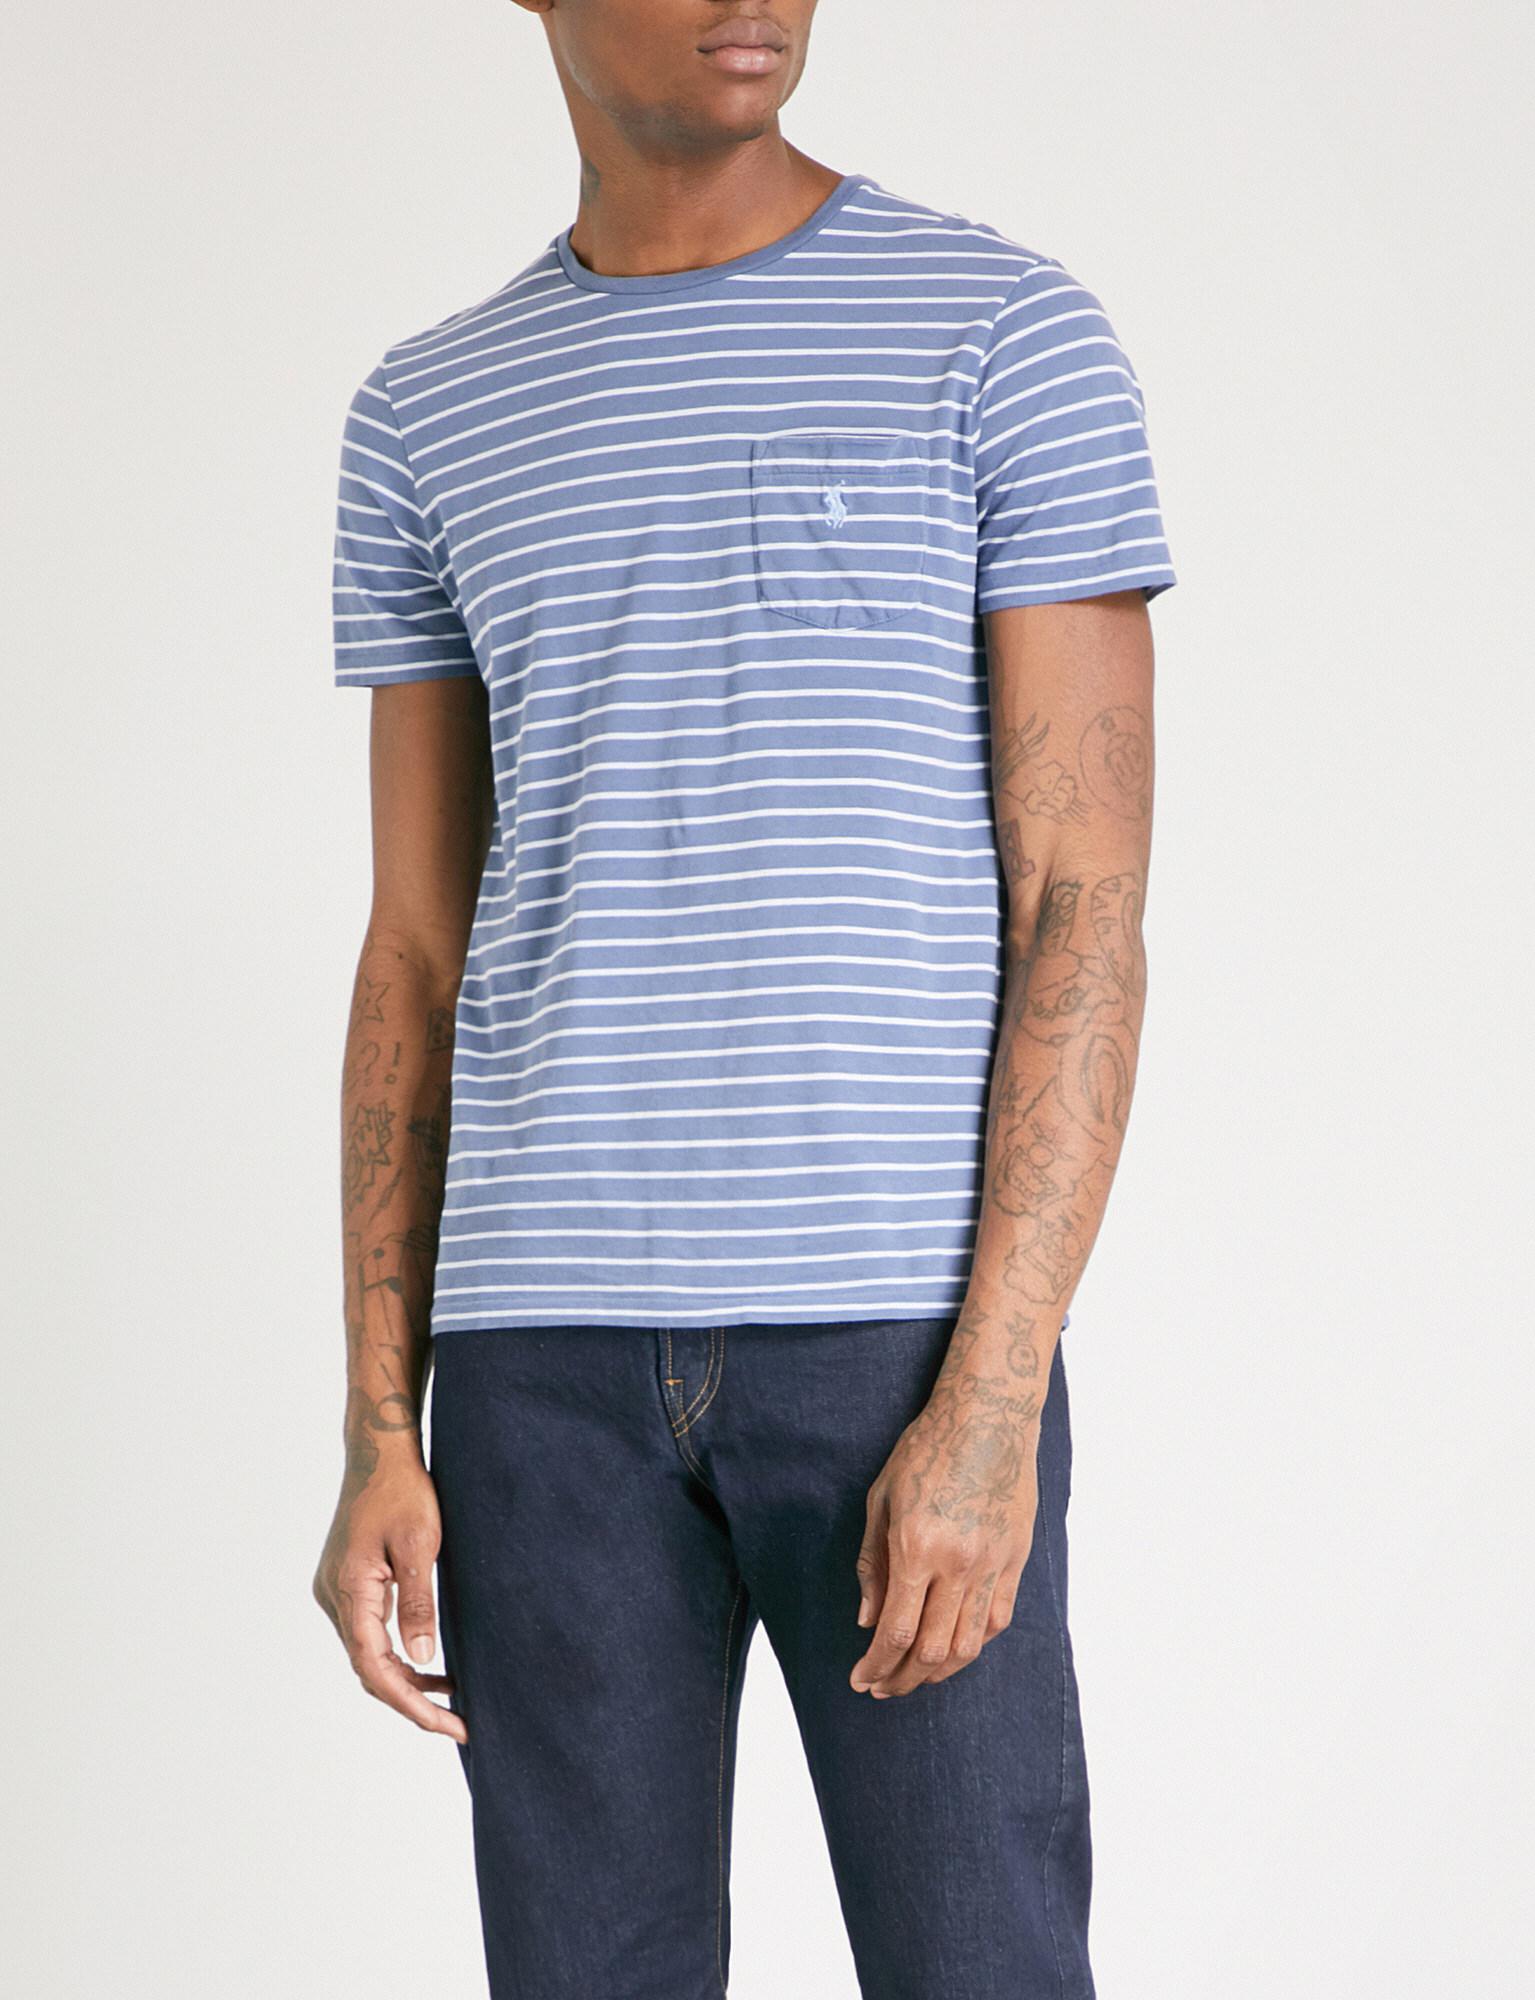 Polo ralph lauren striped cotton jersey t shirt in blue for Ralph lauren polo jersey shirt